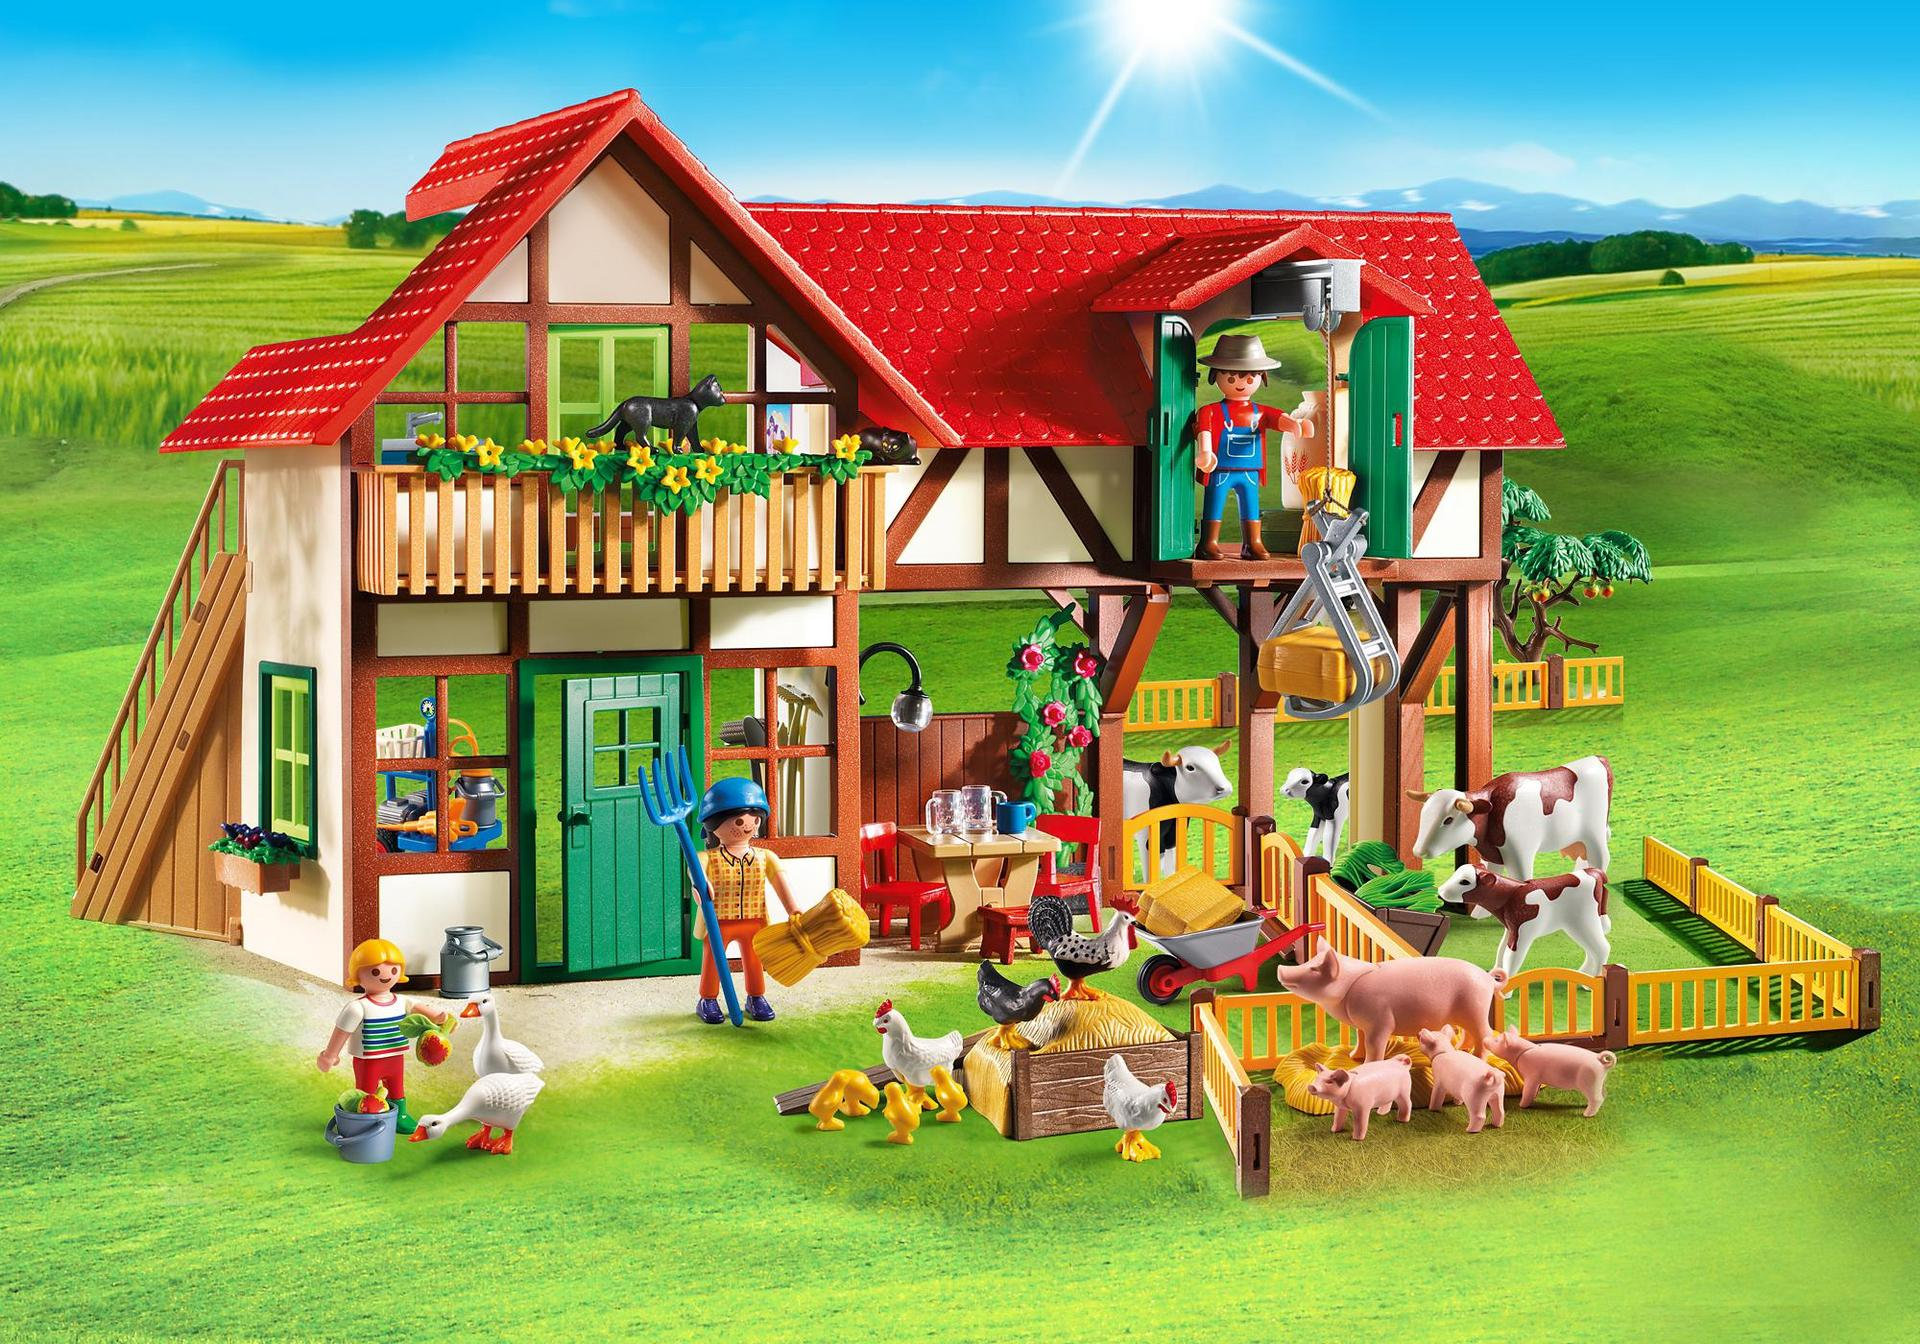 large farm 6120 playmobil united kingdom